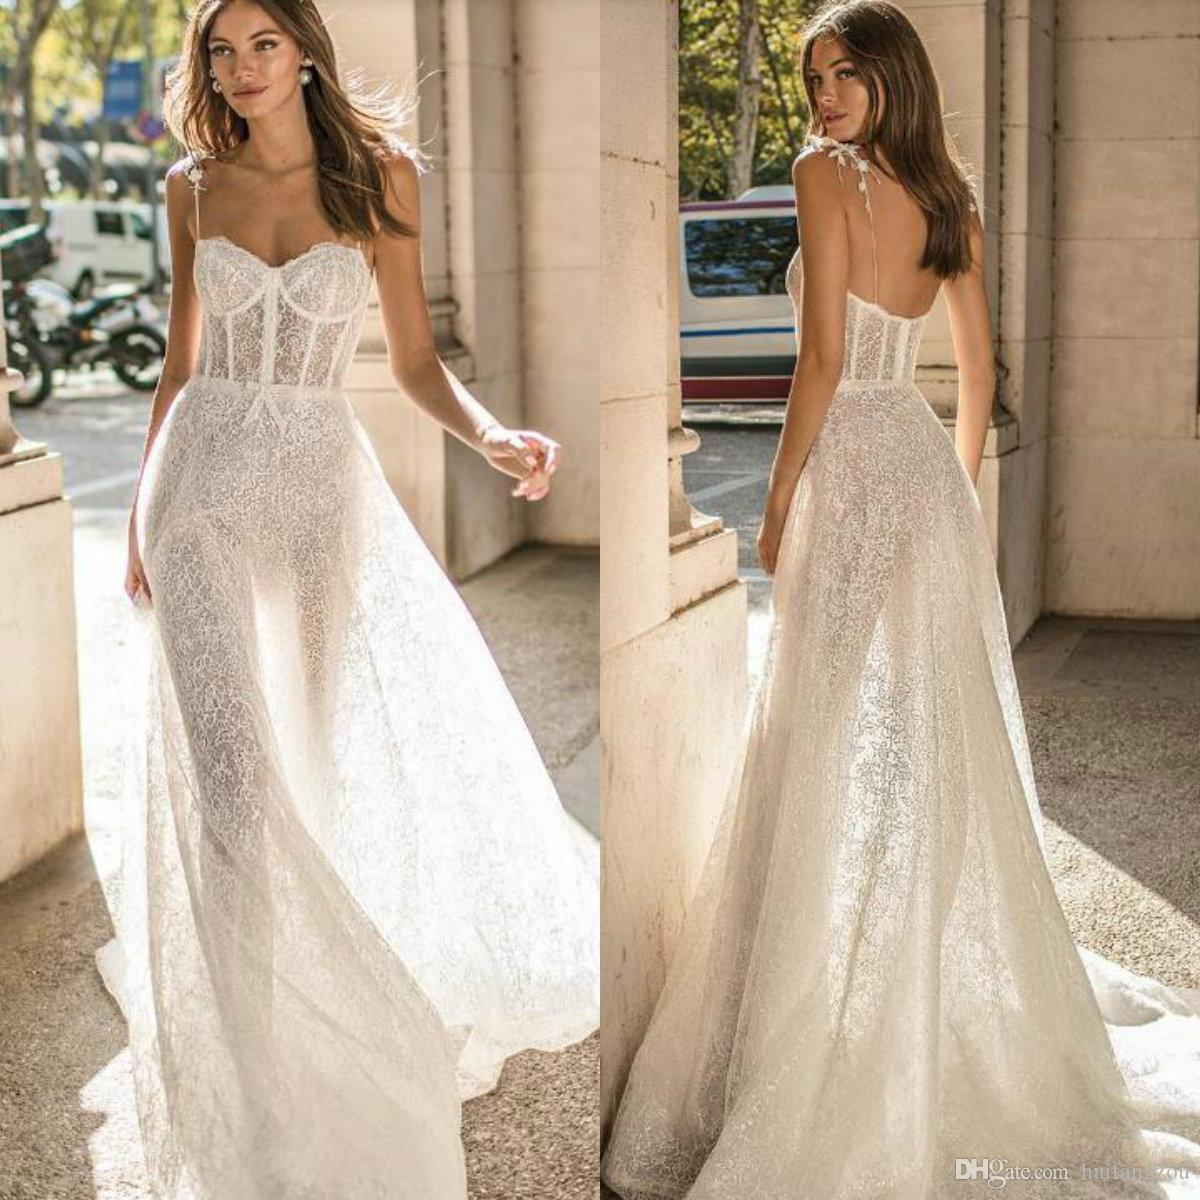 Latest Berta Wedding Dresses Spaghetti Straps Full Lace Sexy Illusion Bridal Gowns Exposed Boning Backless Beach Wedding Dress